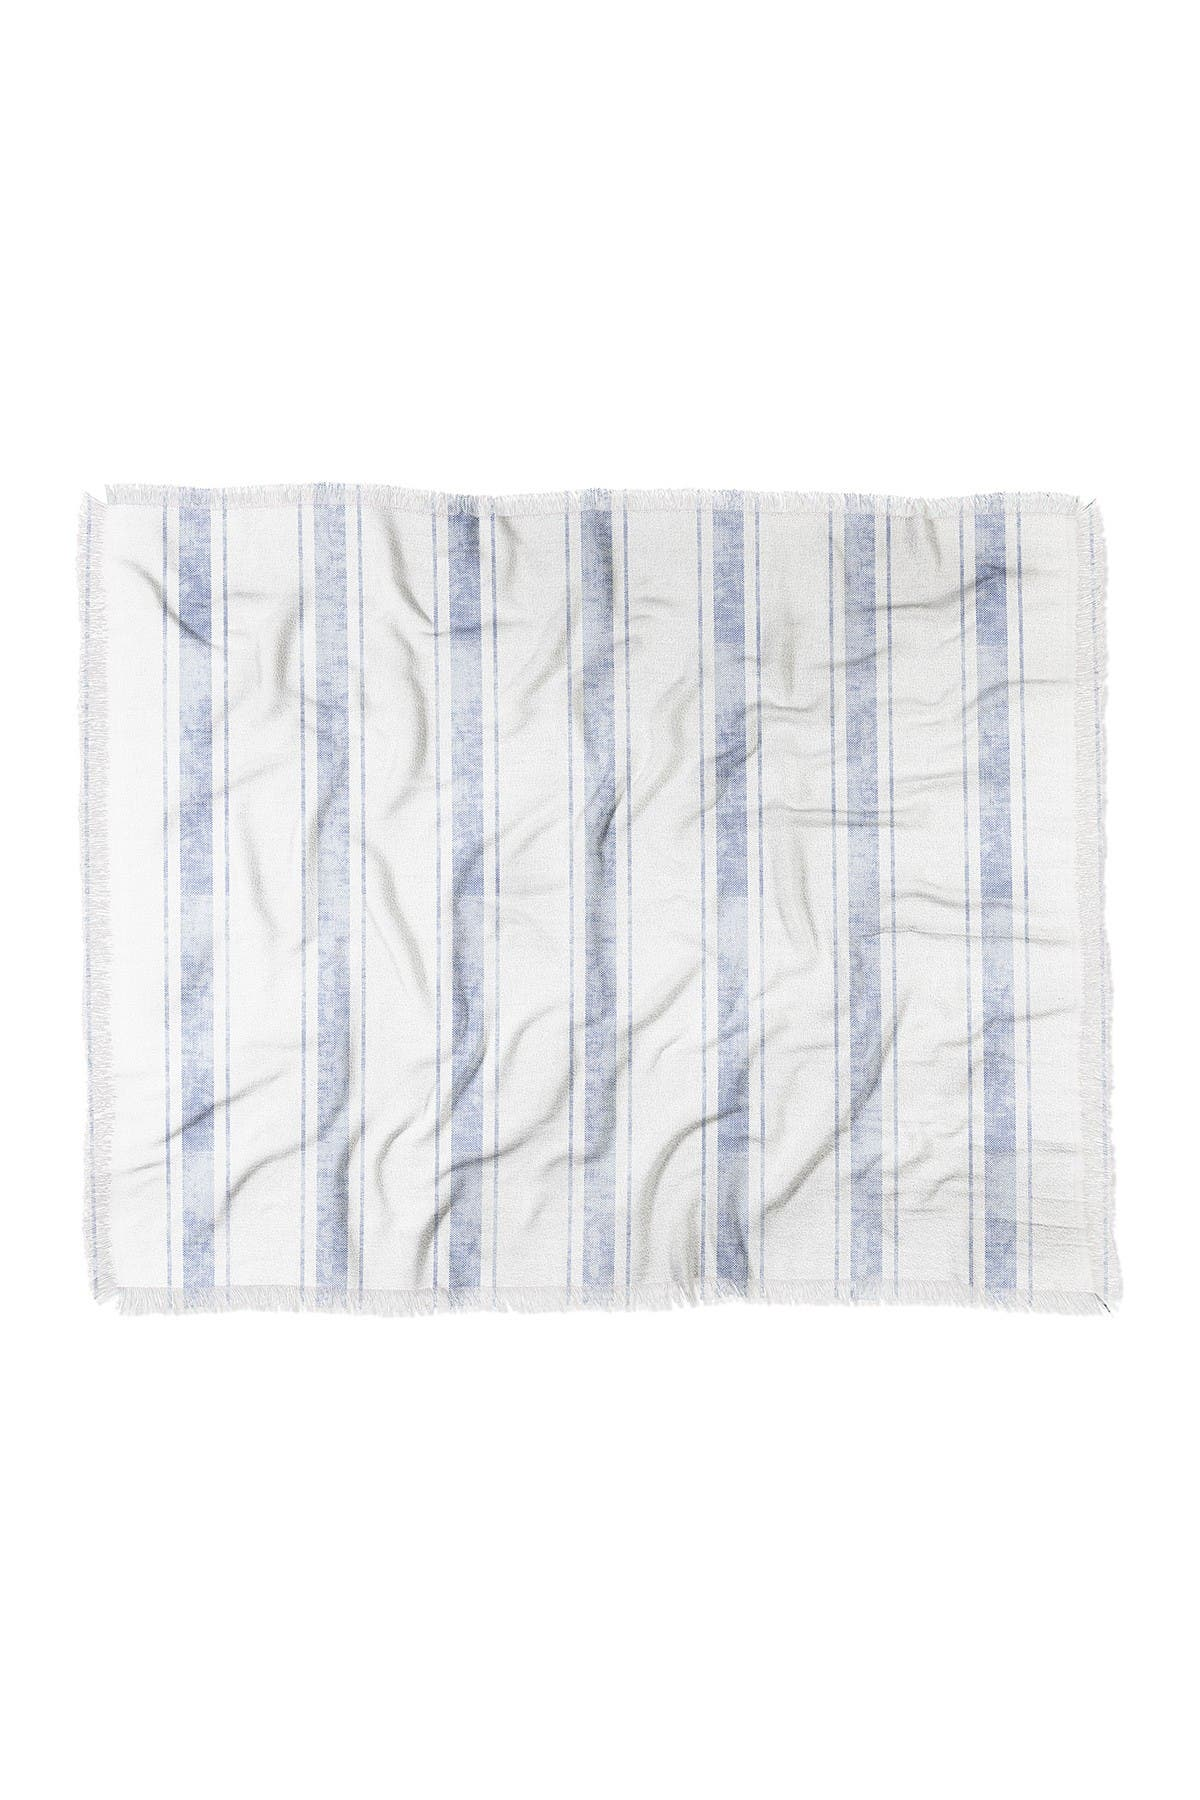 "Image of Deny Designs Holli Zollinger Aegean Bold Stripe Woven Throw Blanket - 60"" x 50"""